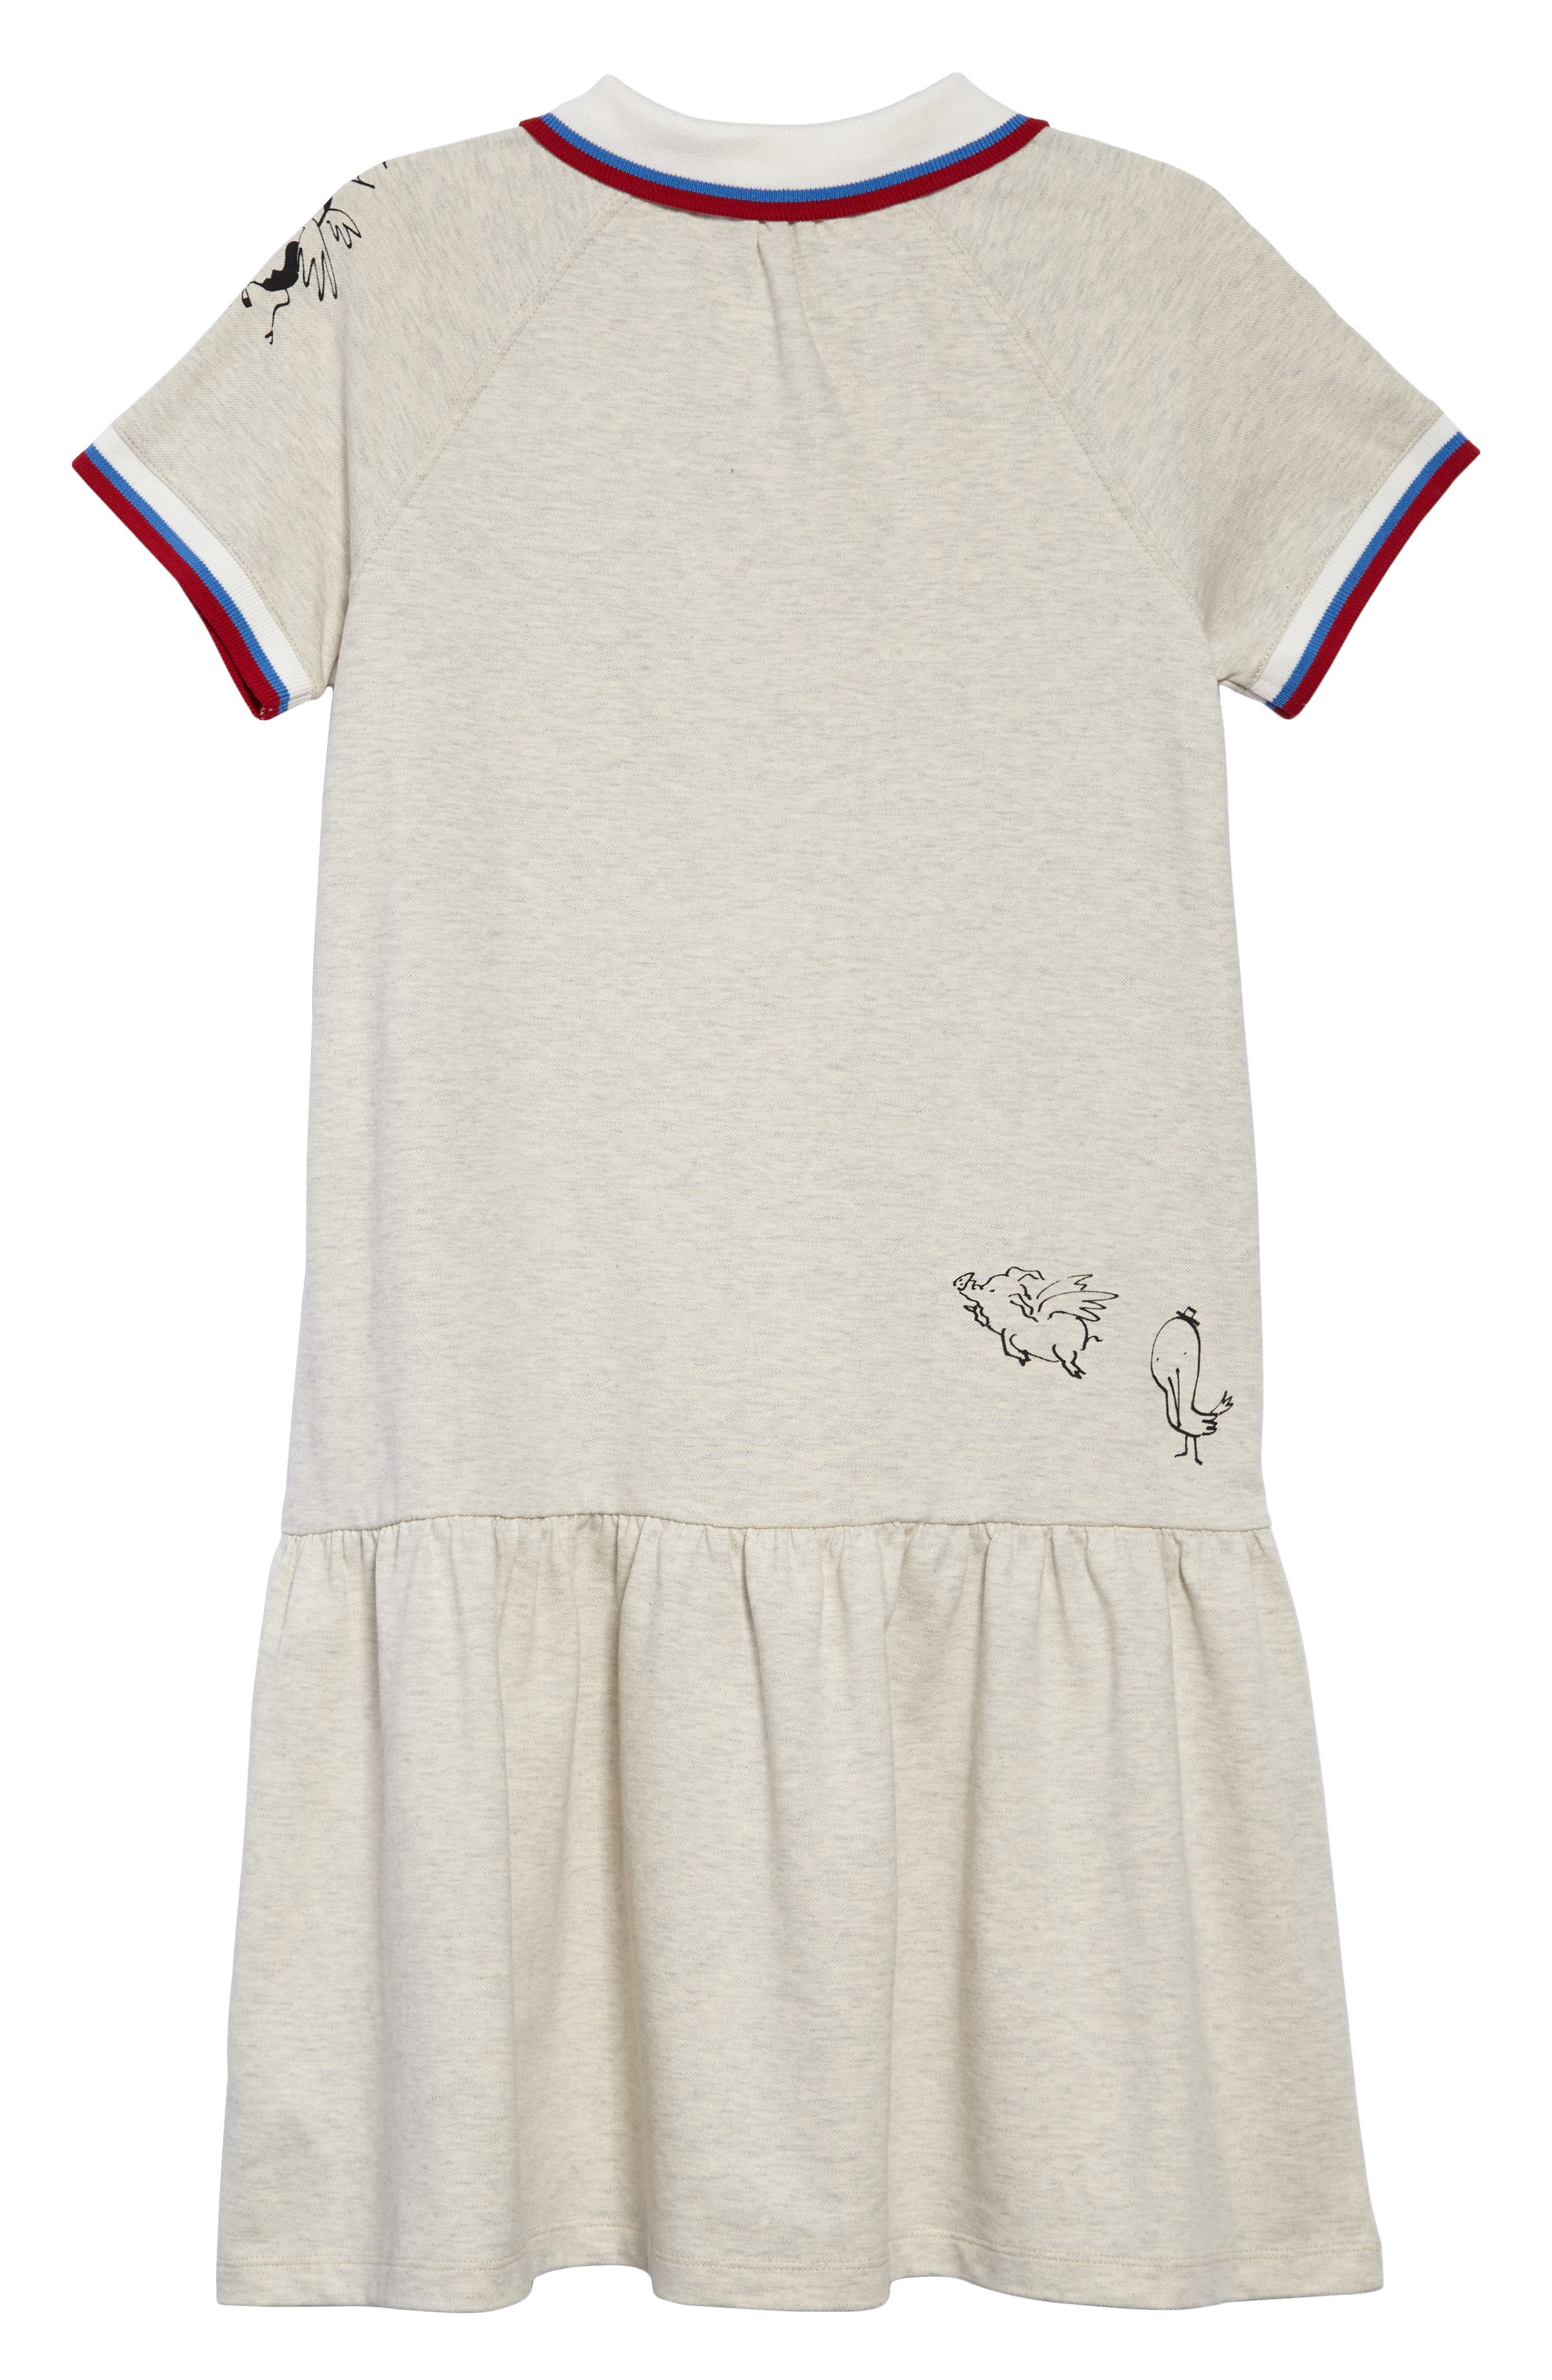 Cali Polo Dress,                             Alternate thumbnail 2, color,                             100